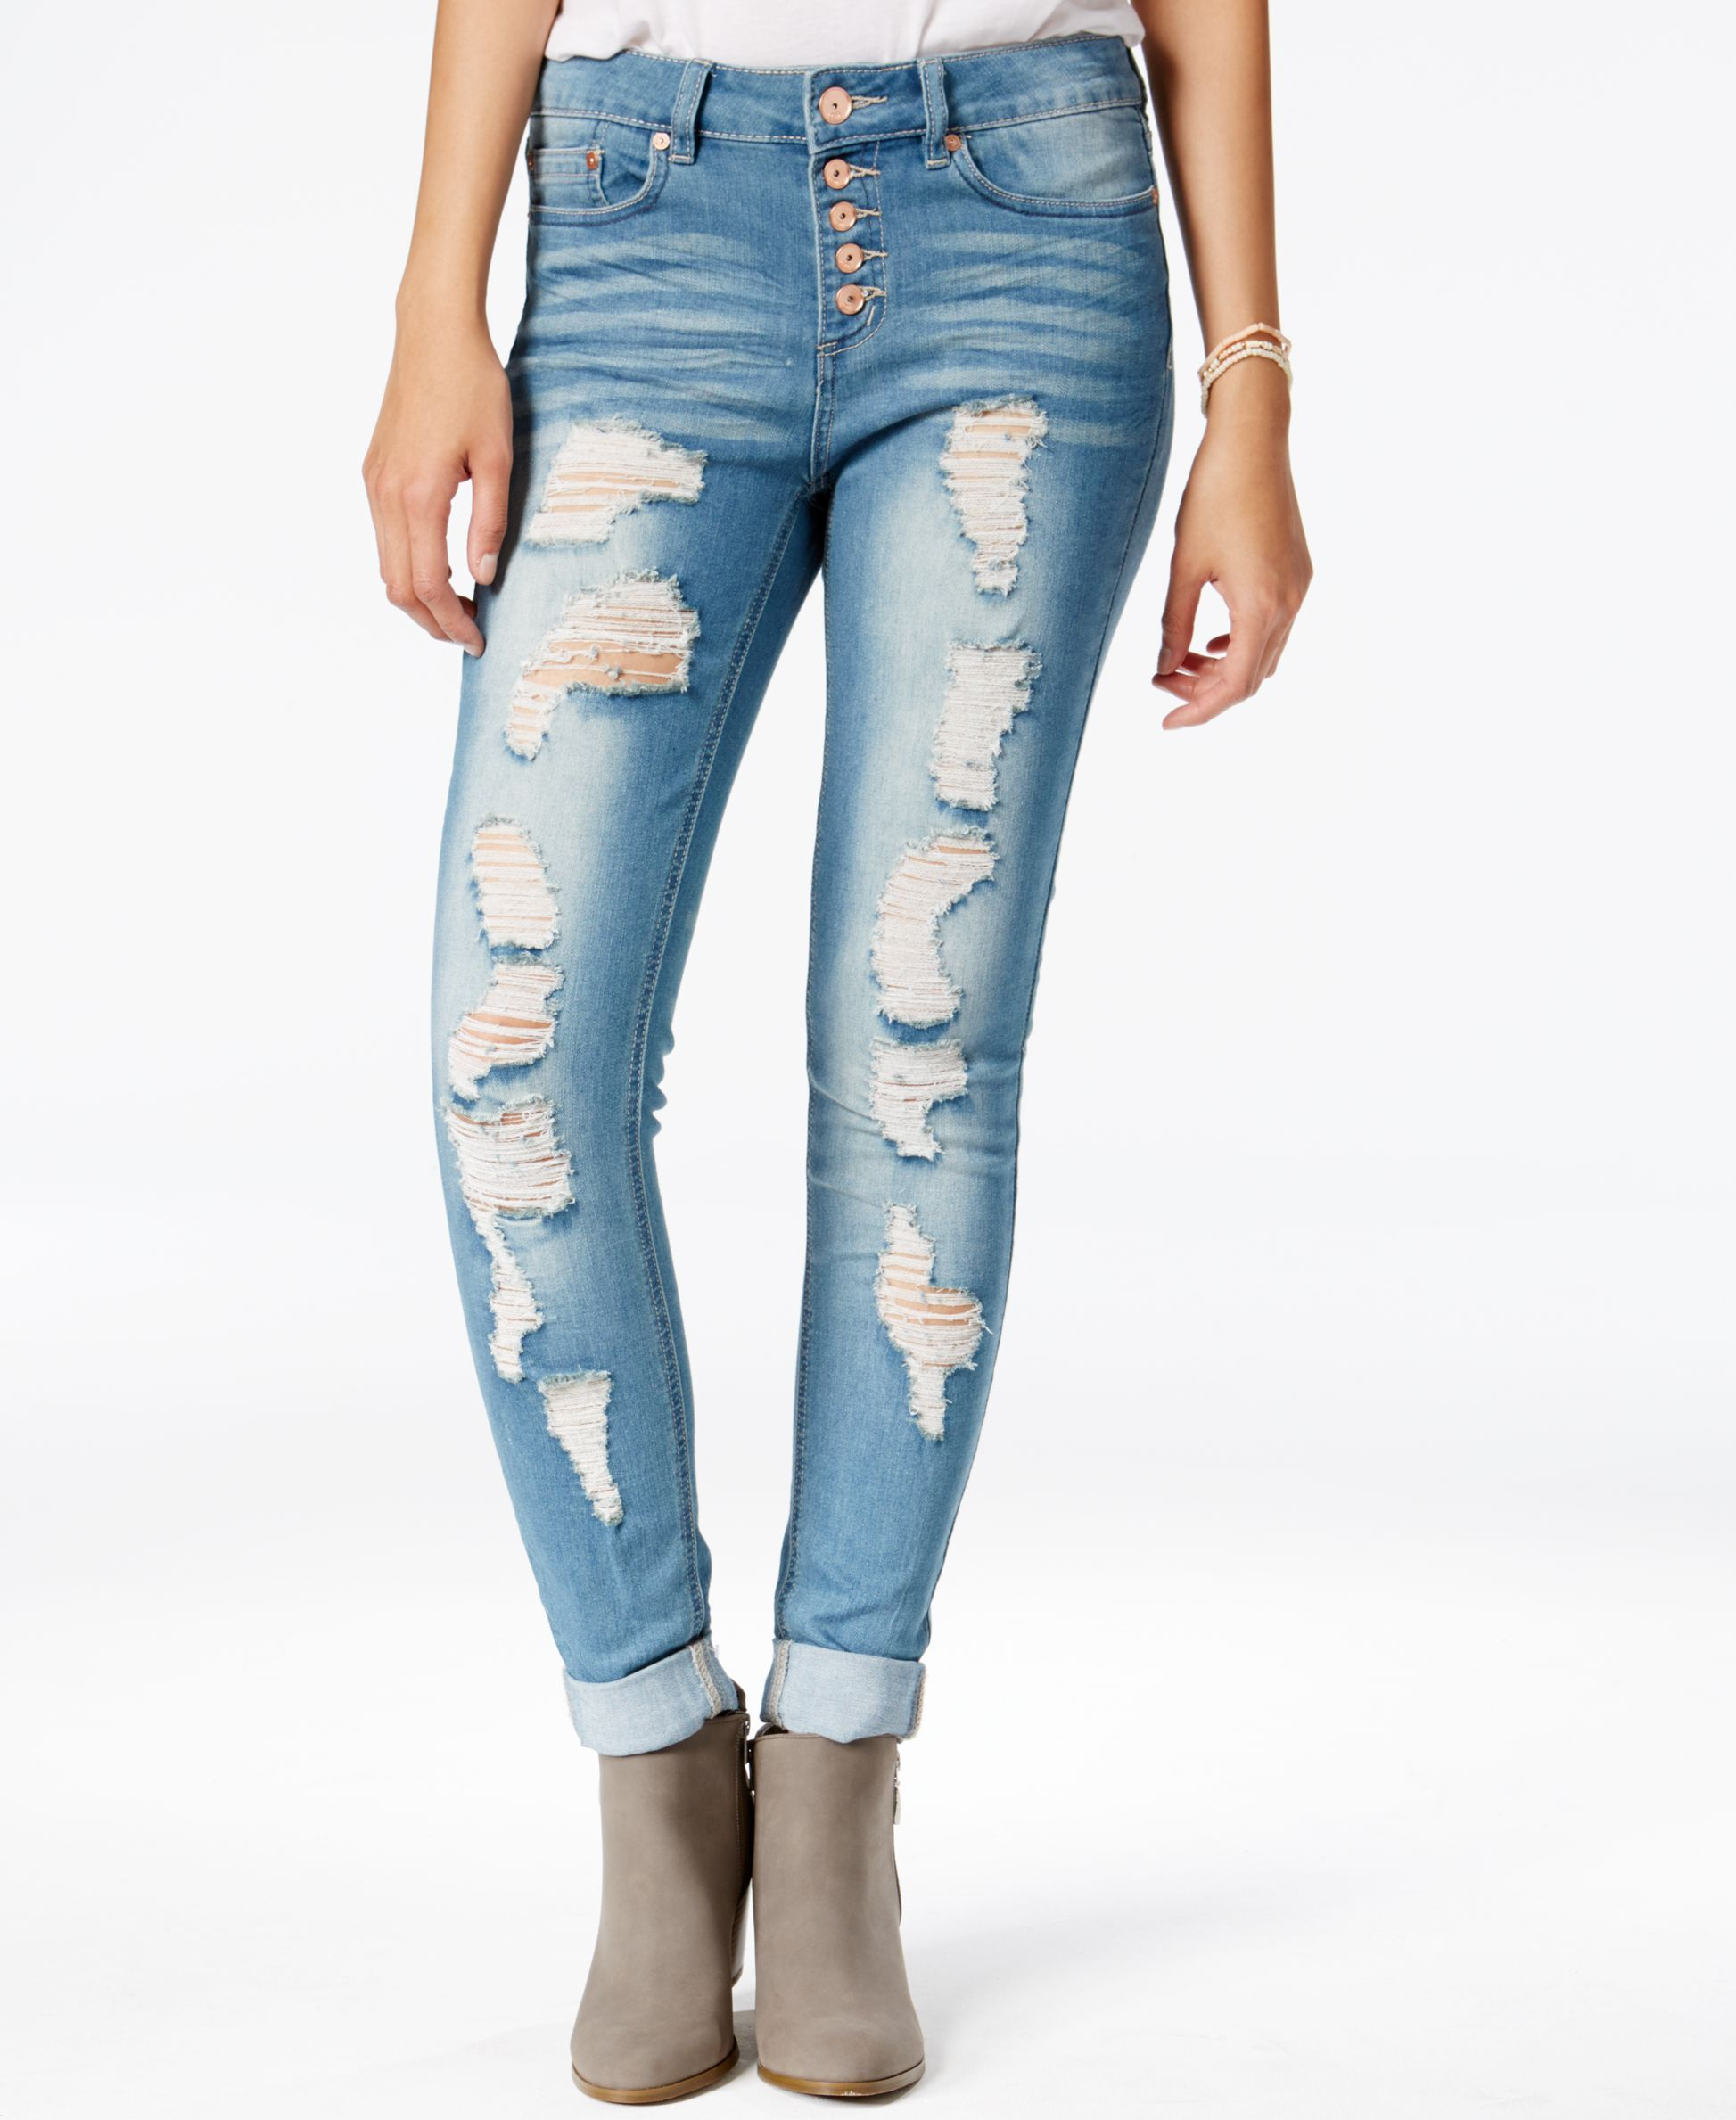 fa2a06527c Indigo Blue Juniors' Button-Front Super-Soft Ripped Skinny Jeans ...